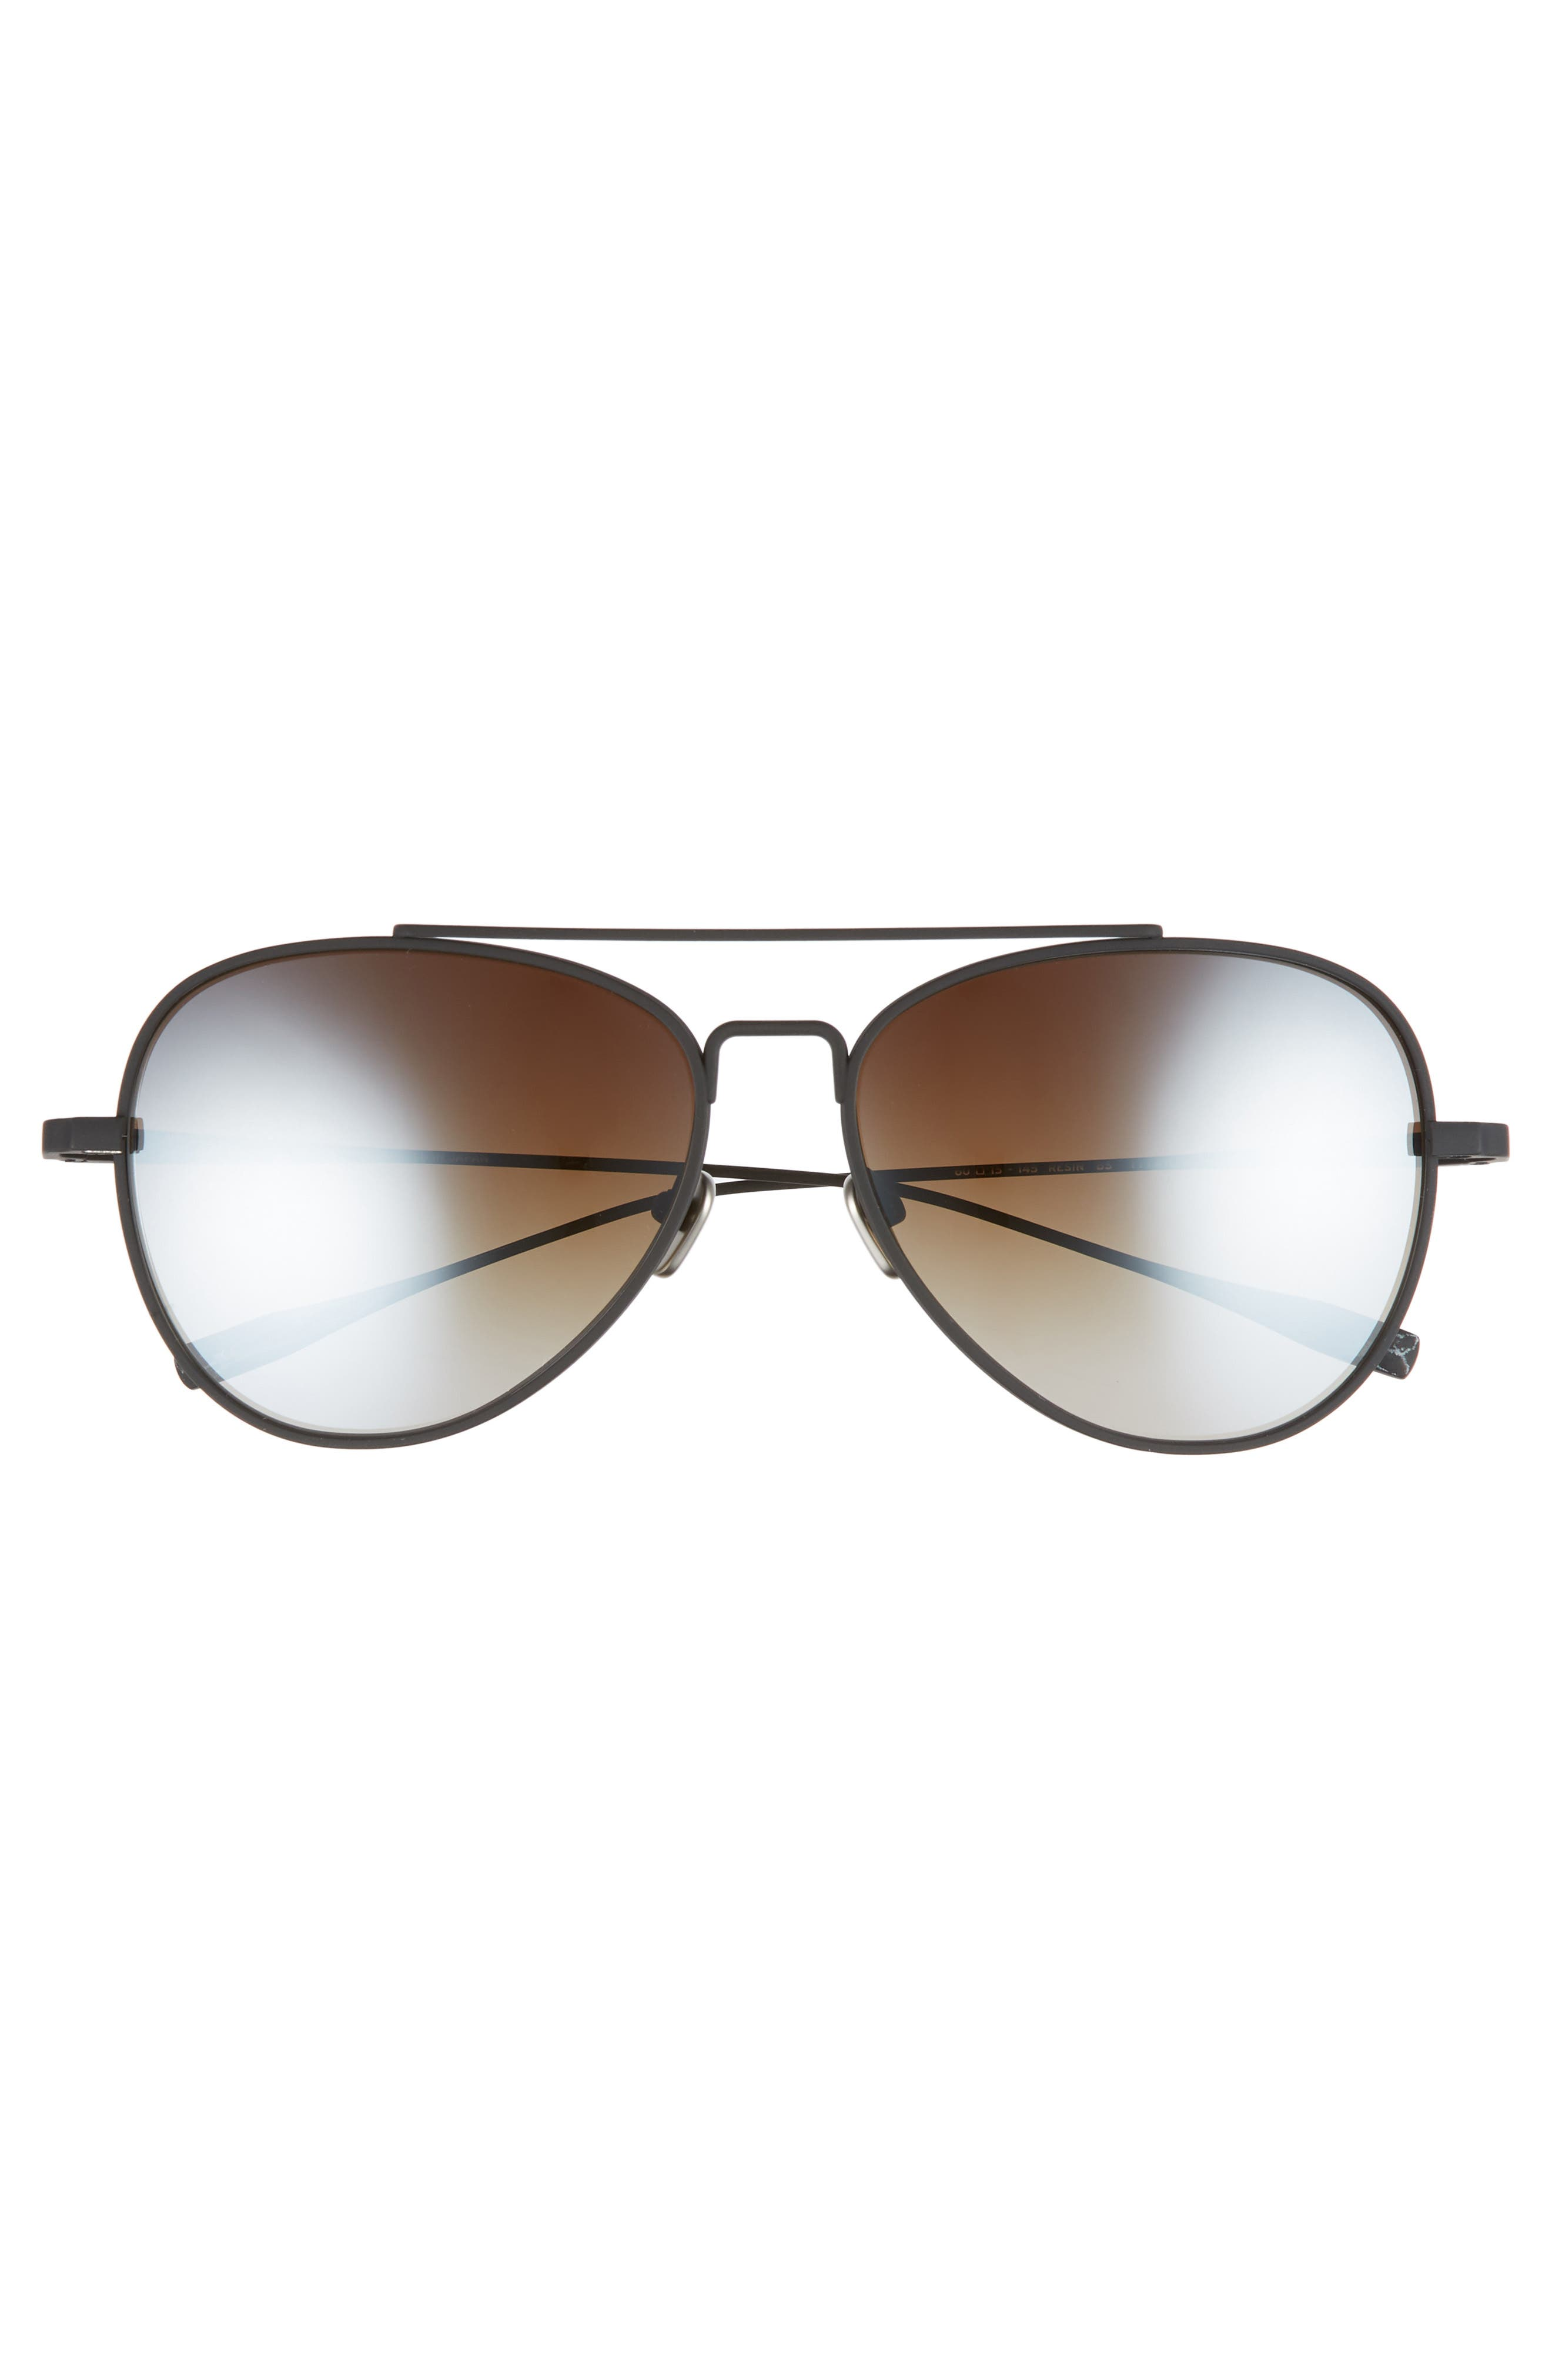 60mm Polarized Aviator Sunglasses,                             Alternate thumbnail 2, color,                             BLACK